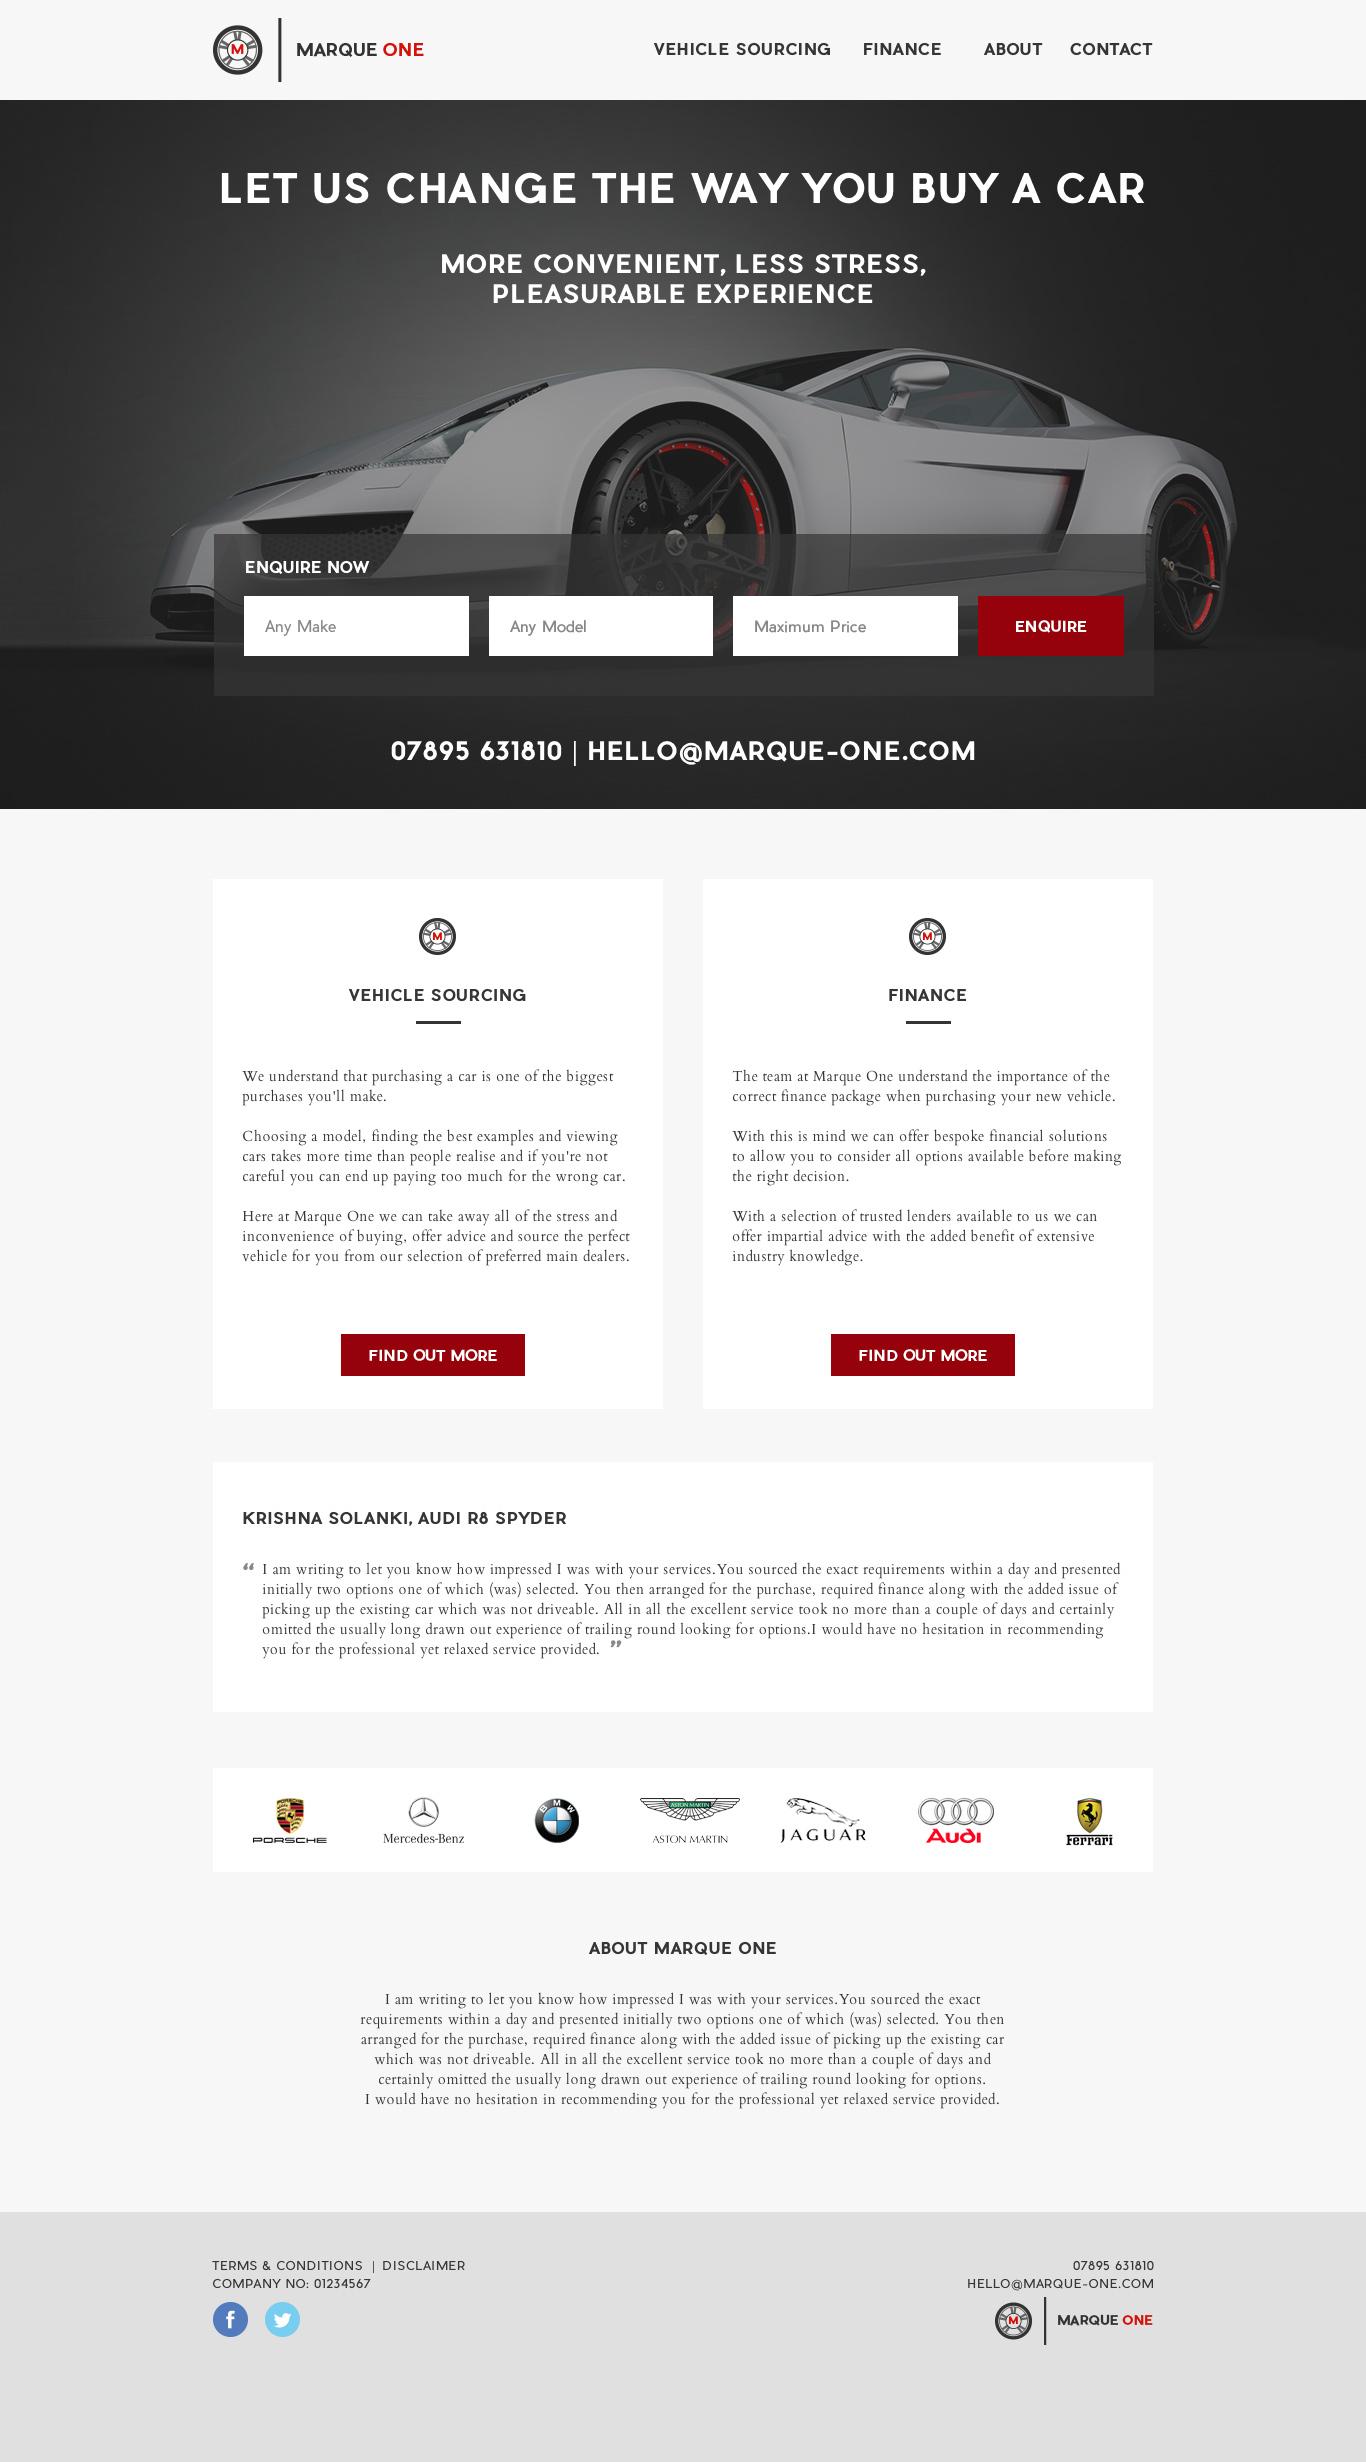 Marque One - Website design